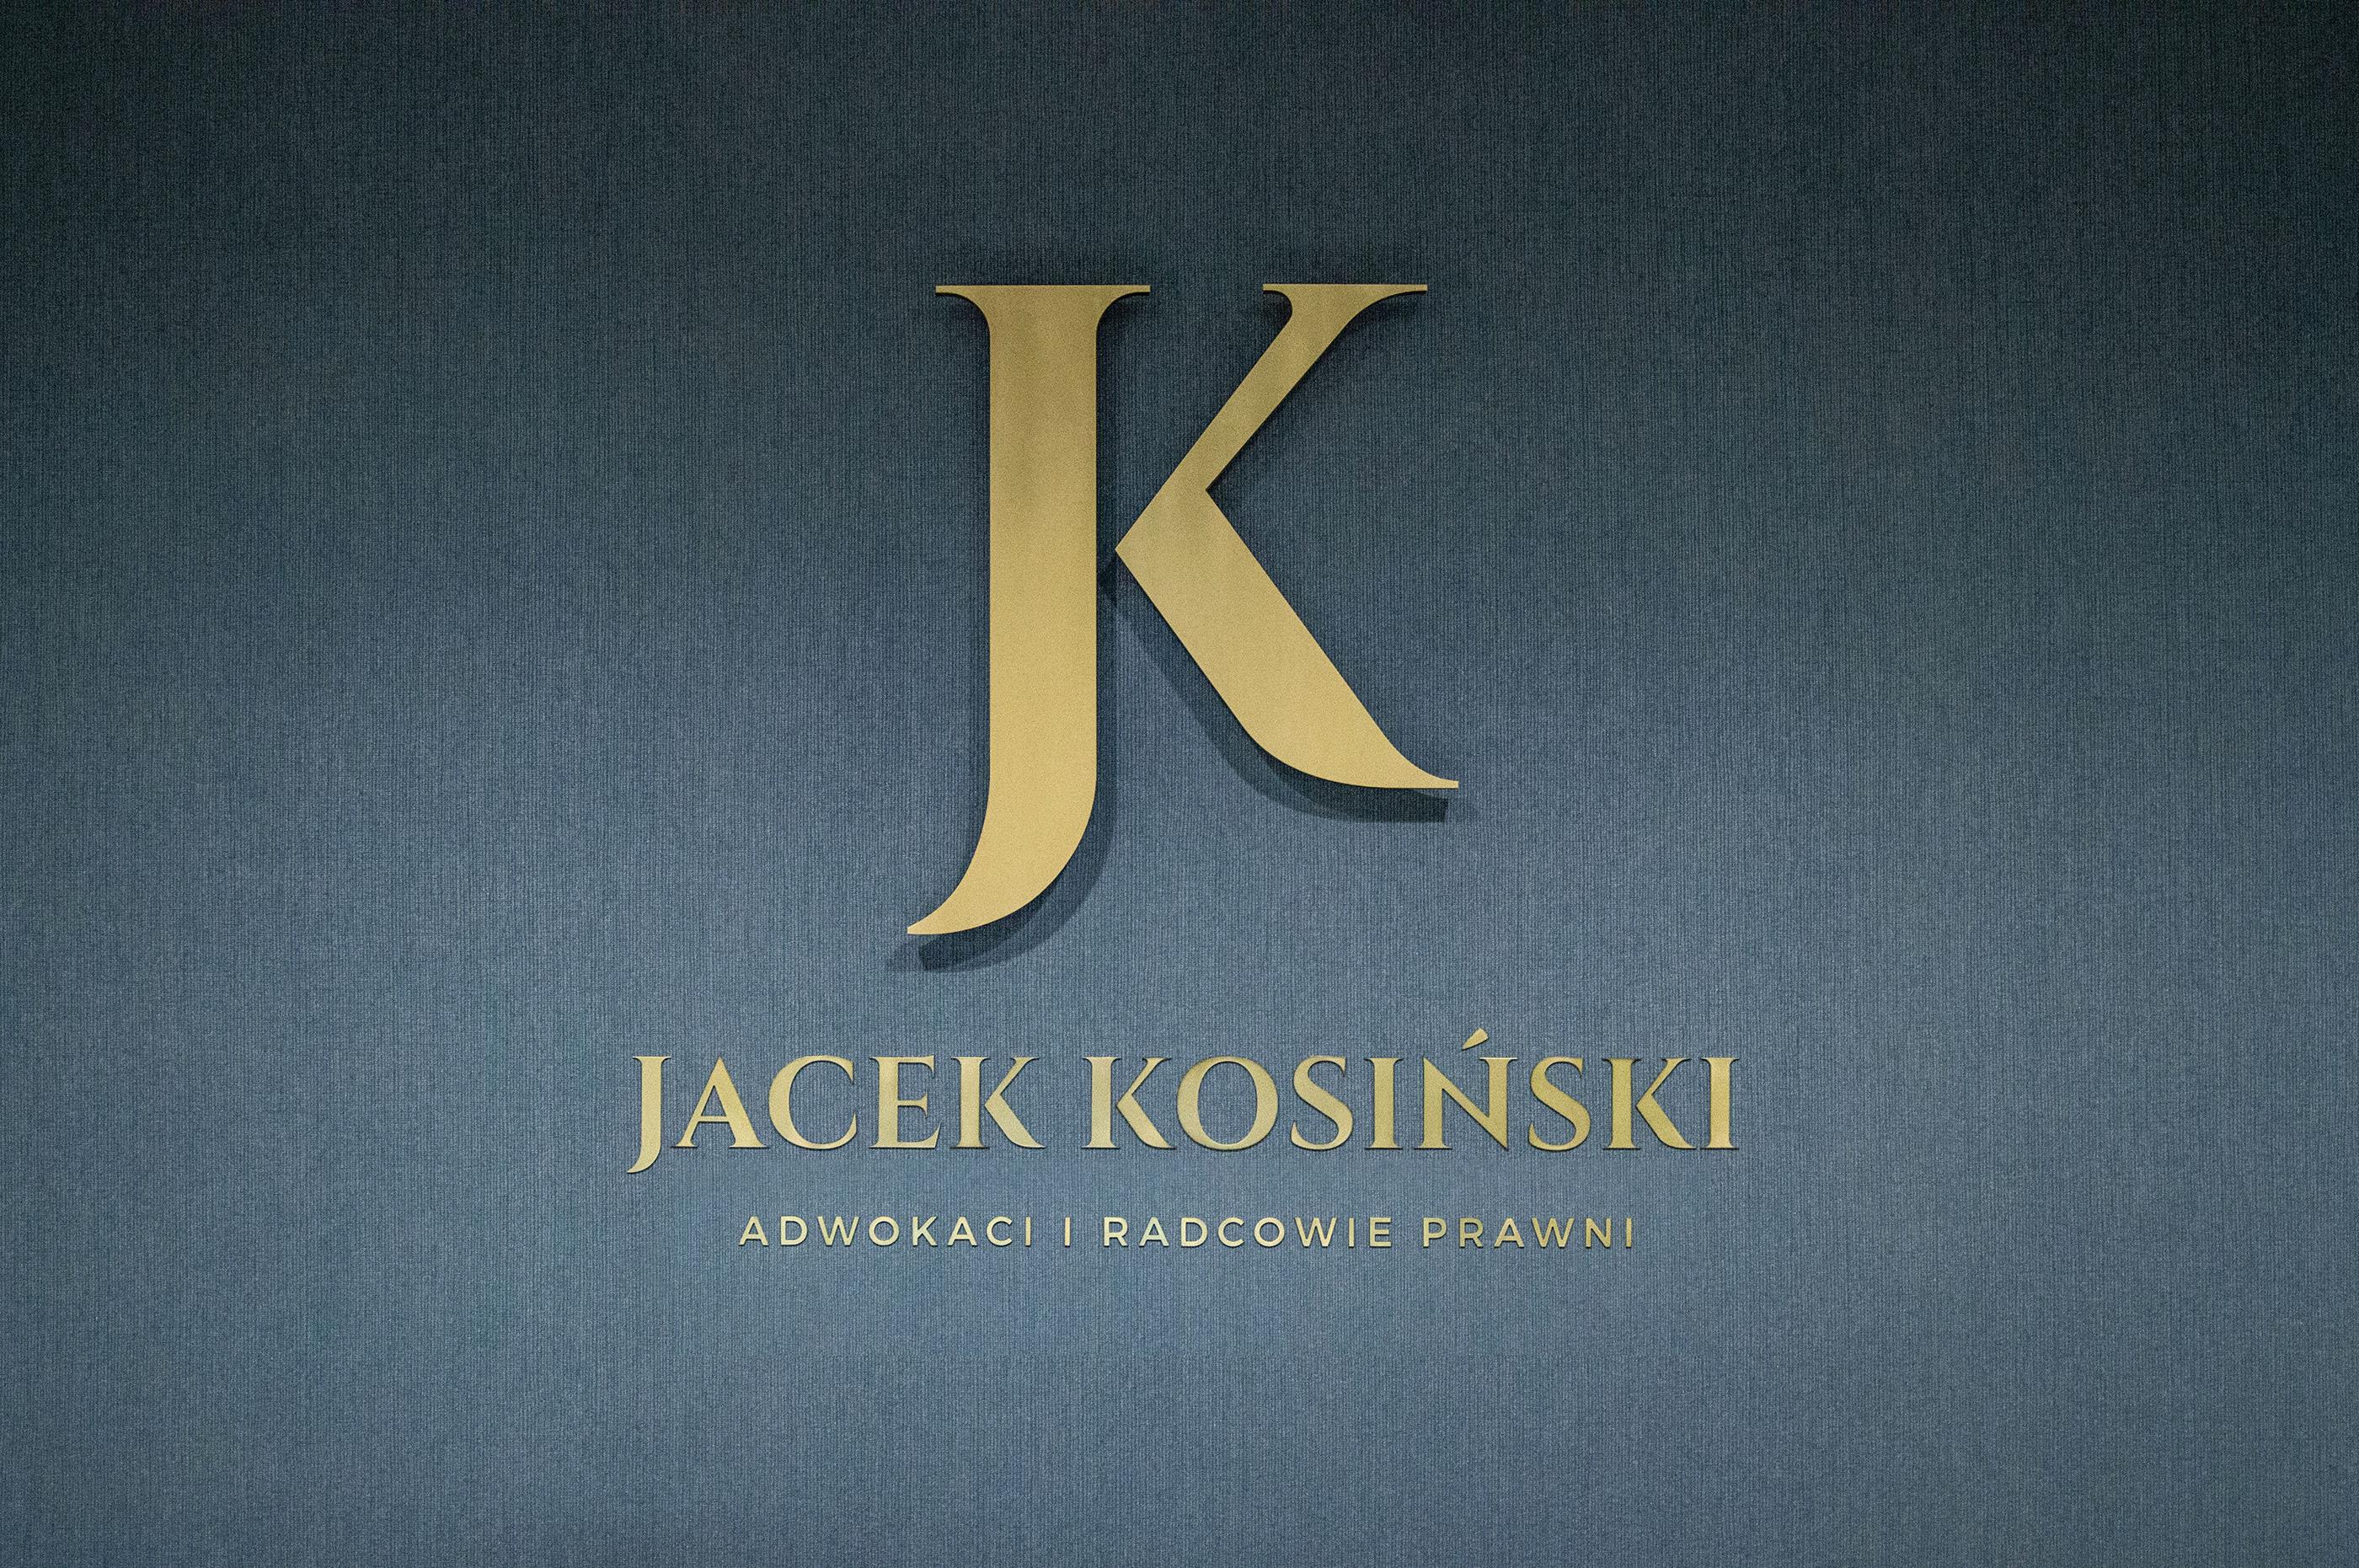 Jacek Kosiński